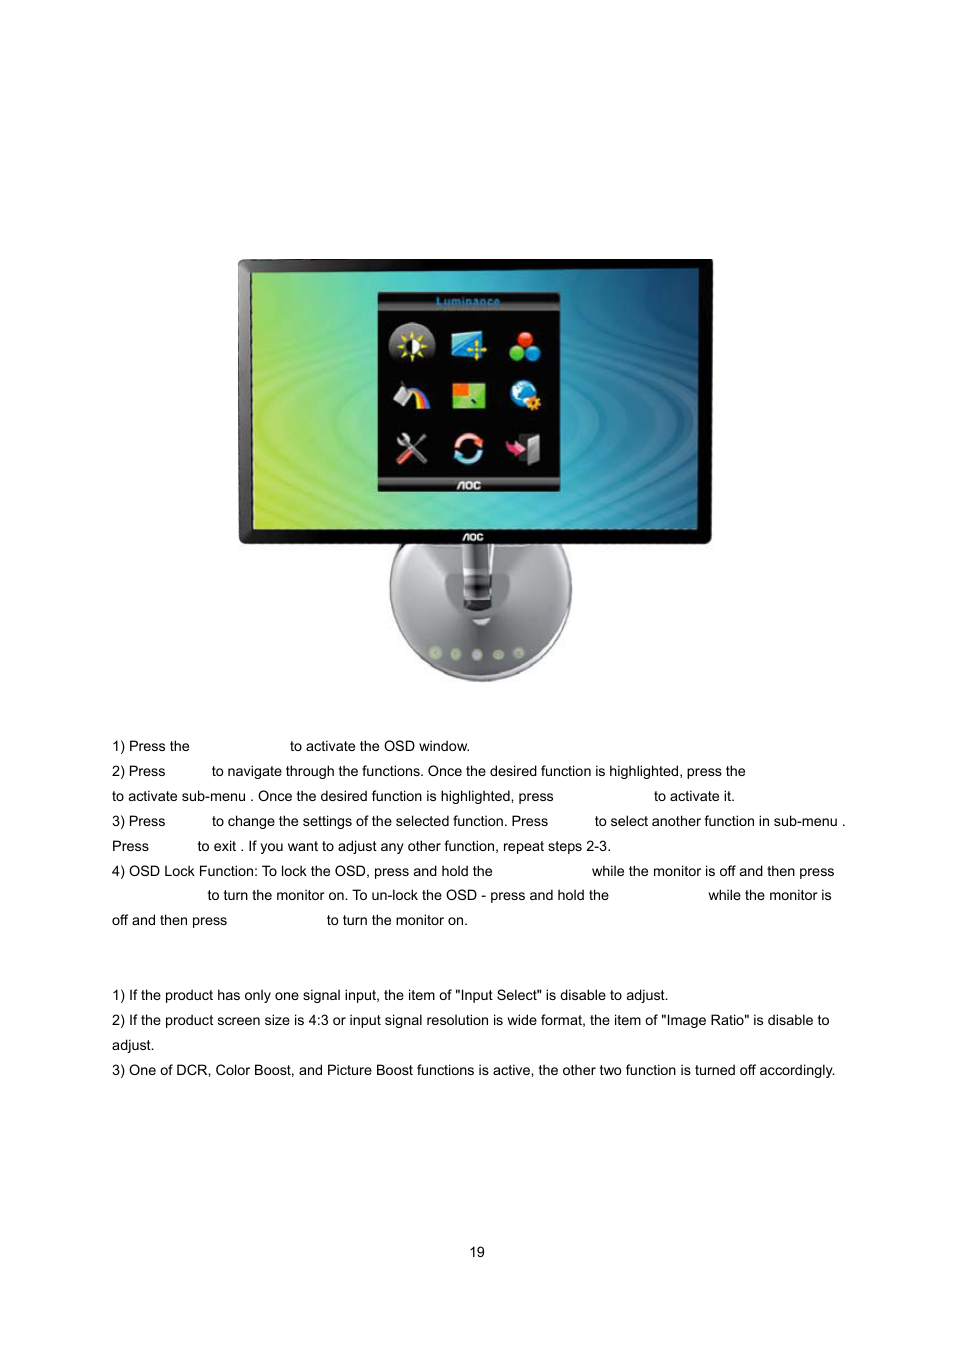 osd setting aoc e2043fk user manual page 18 63 rh manualsdir com AOC Flat Panel Monitor Adjust AOC Monitor